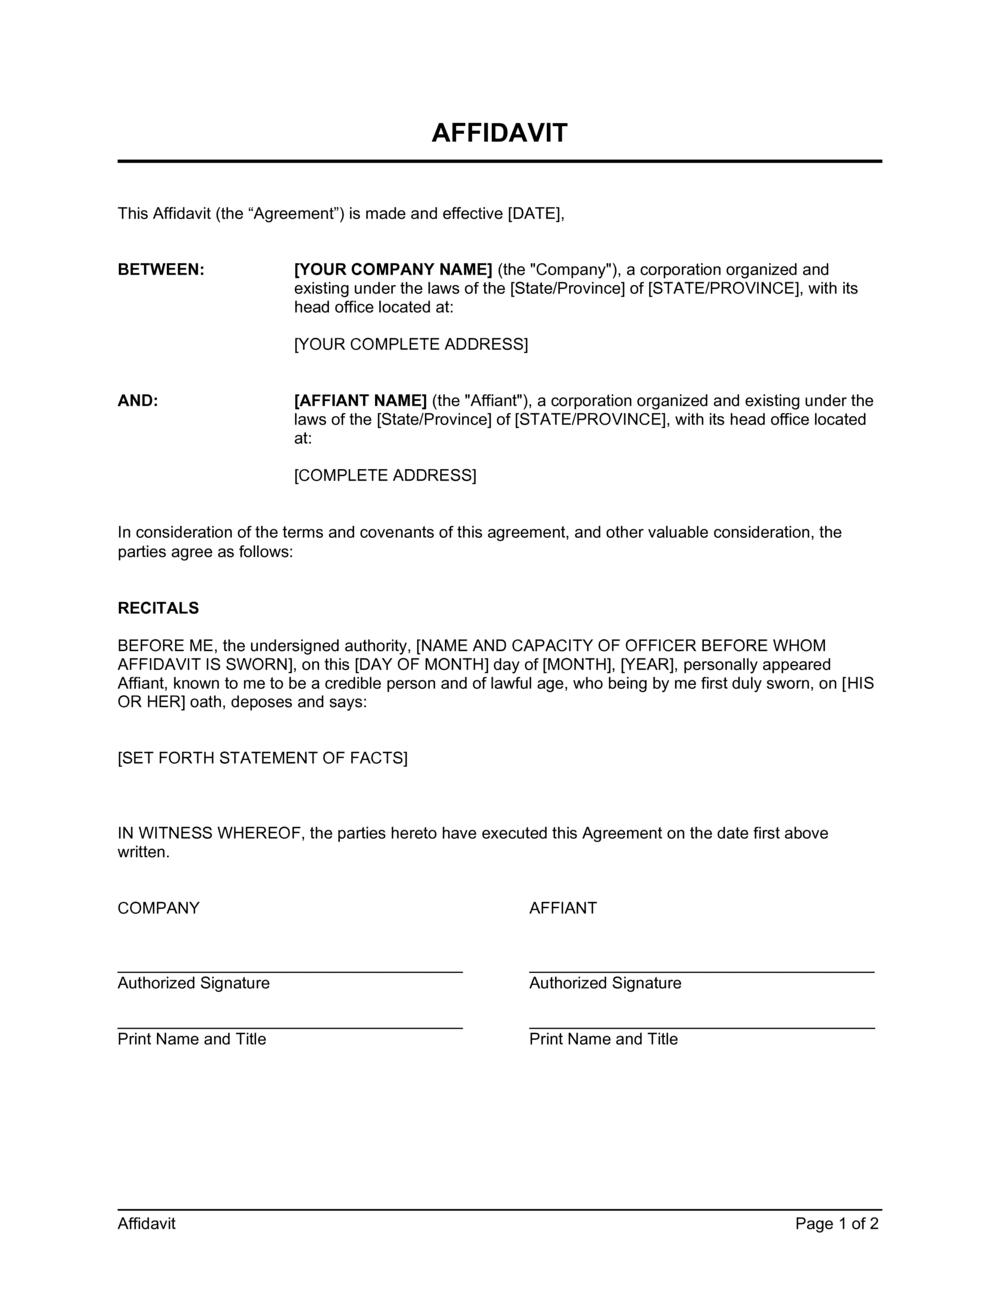 Business-in-a-Box's Affidavit Template